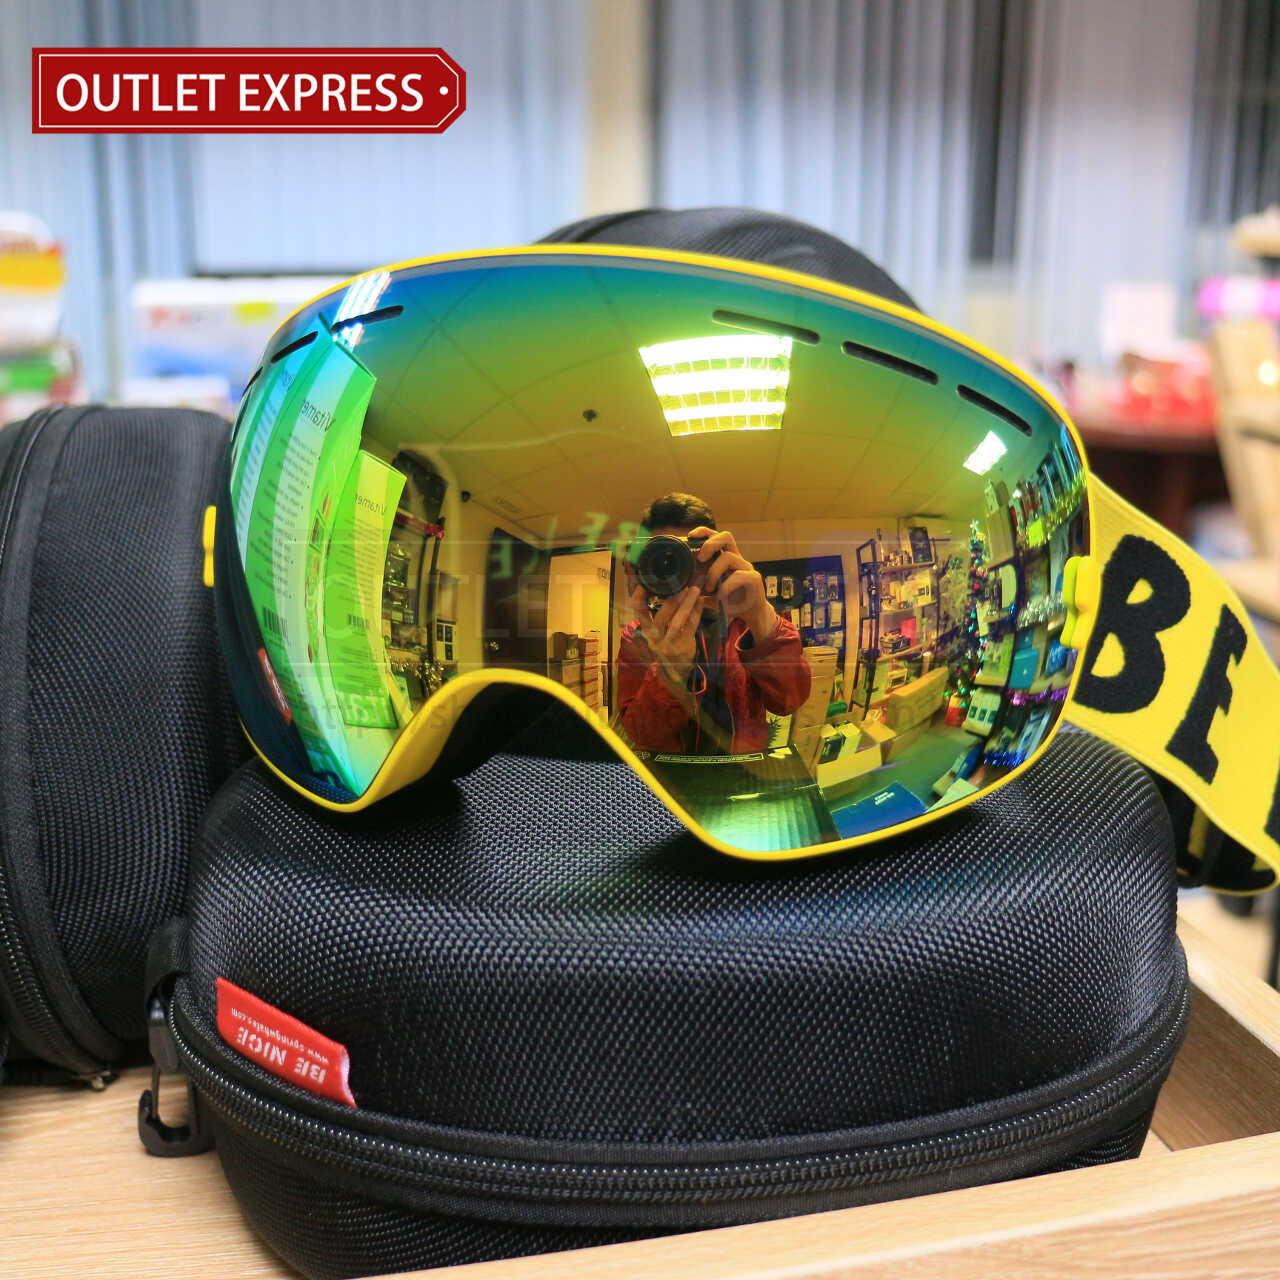 BENICE 大球面雙層防霧滑雪鏡 | 可配合眼鏡用 黃色 -Outlet Express HK生活百貨城實拍相片